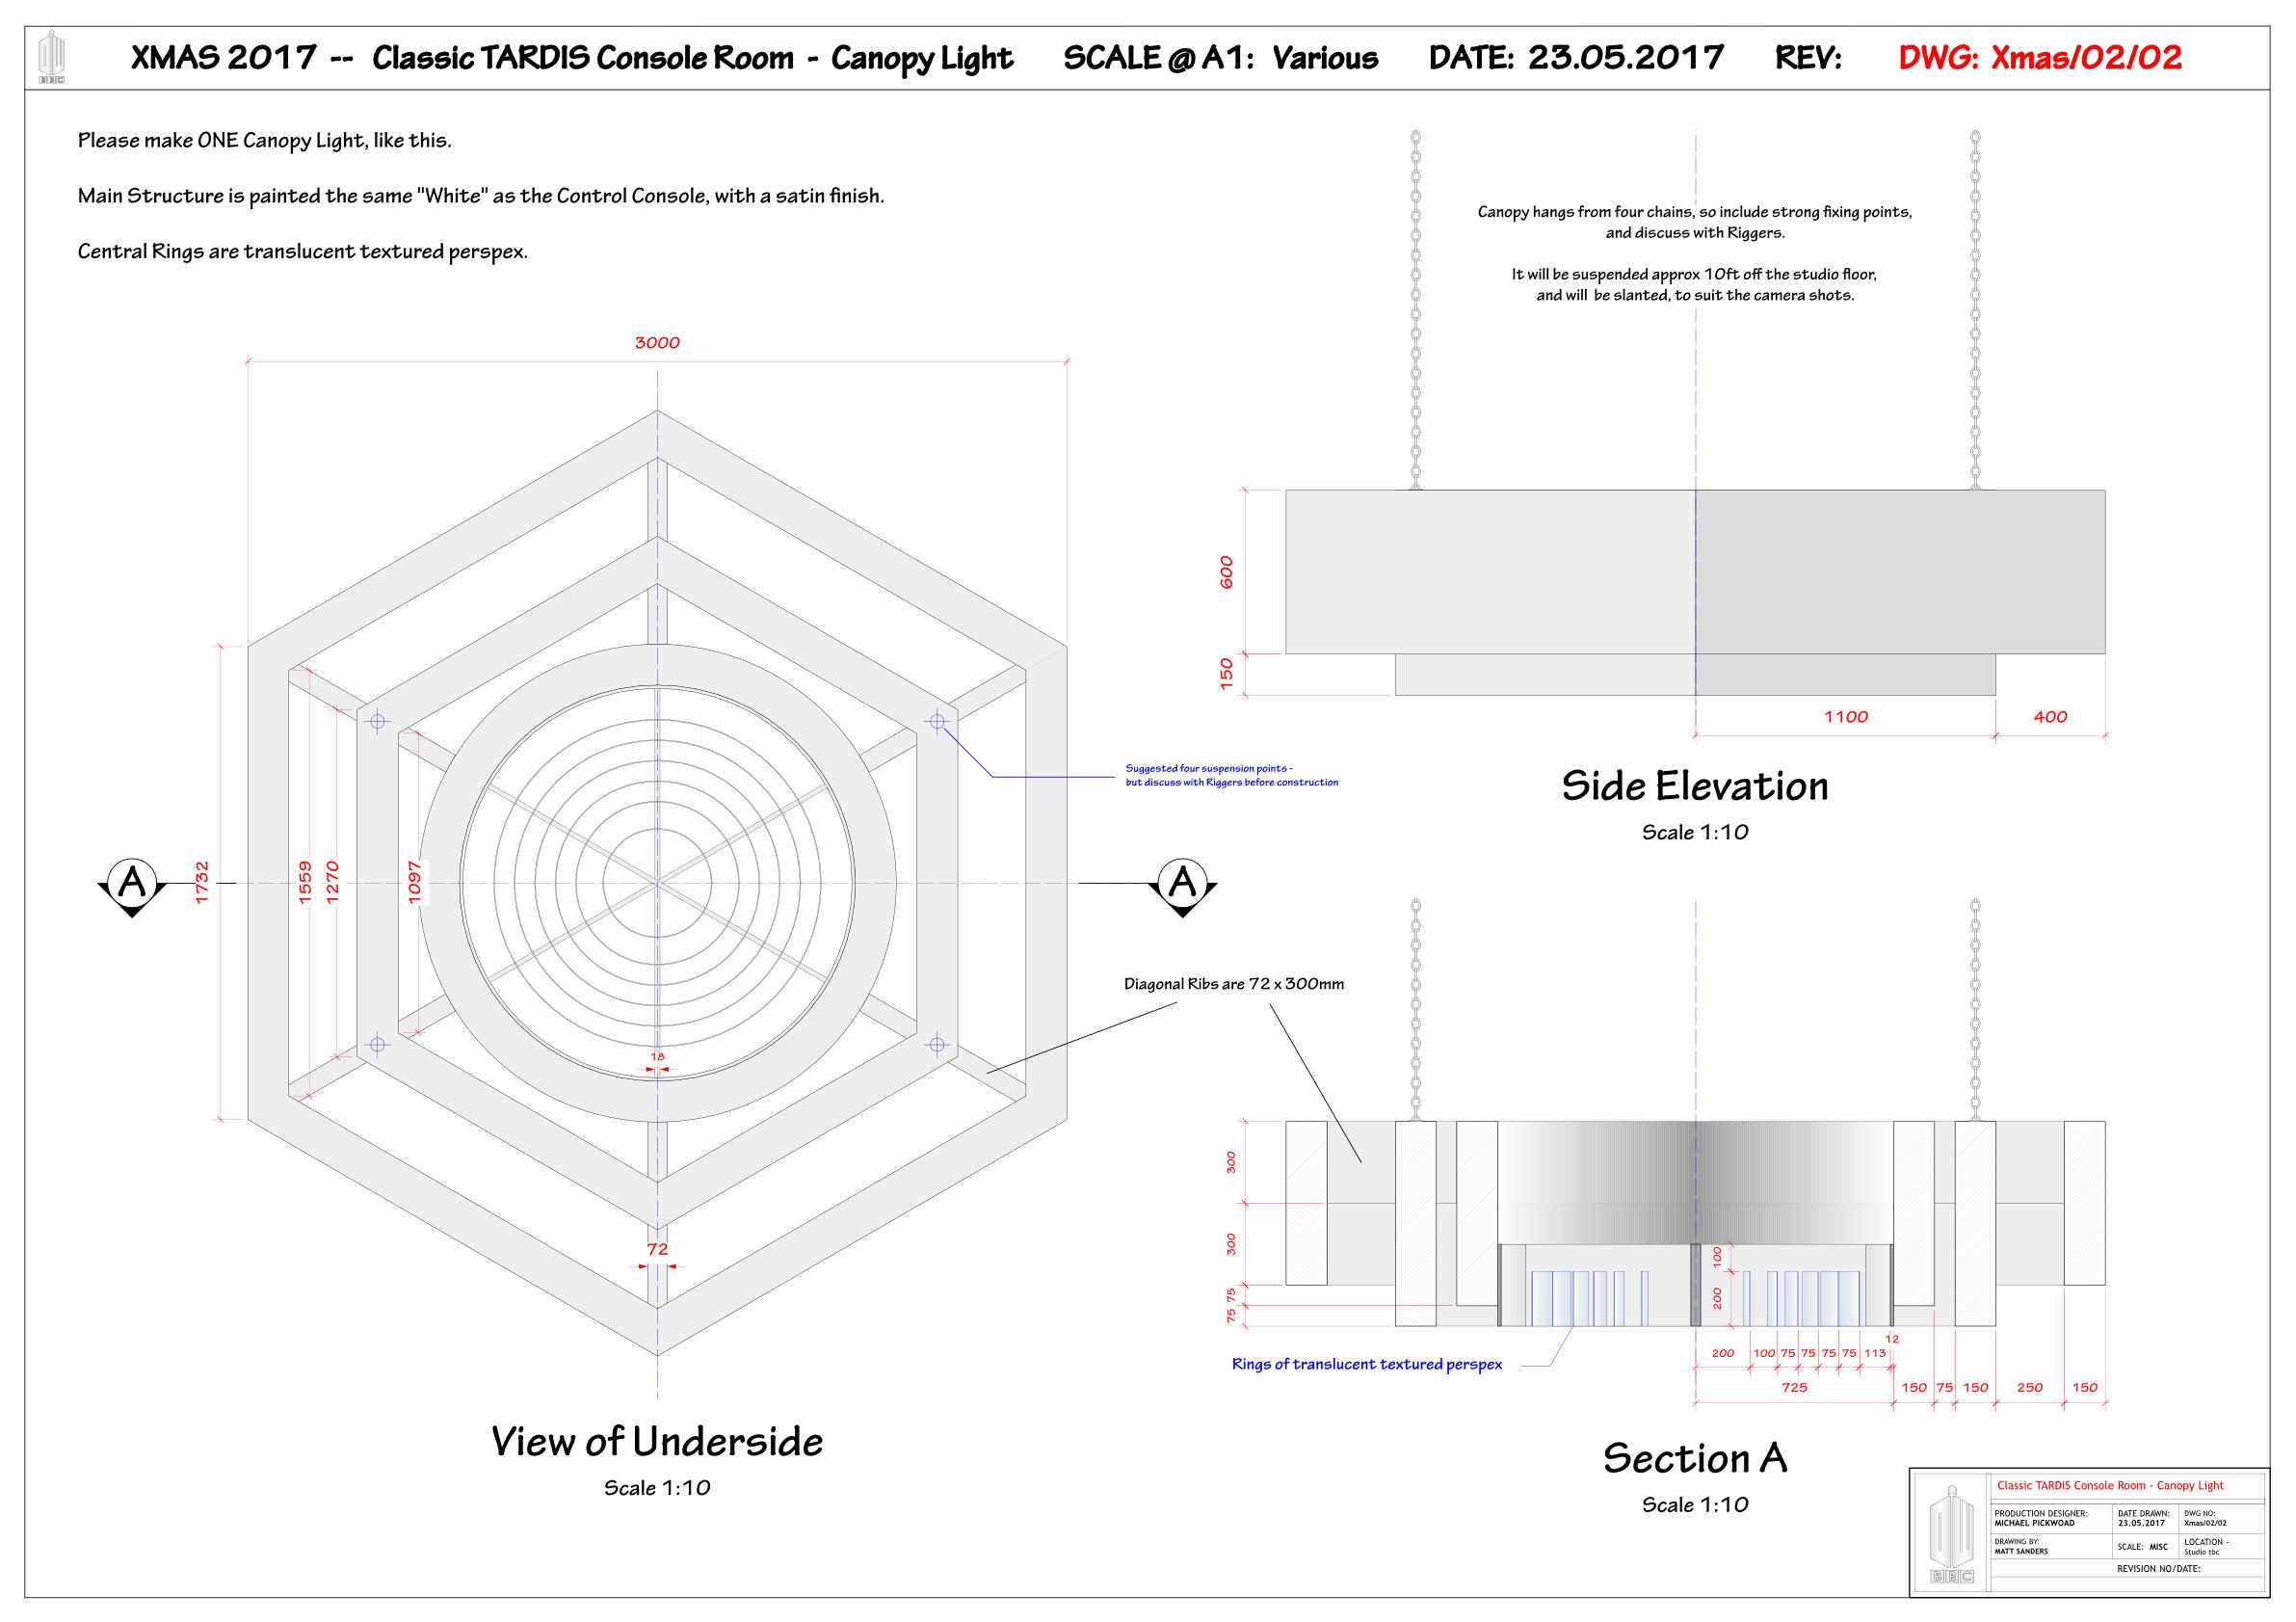 Xmas:02:02-ClassicTARDIS-CanopyLight.jpg